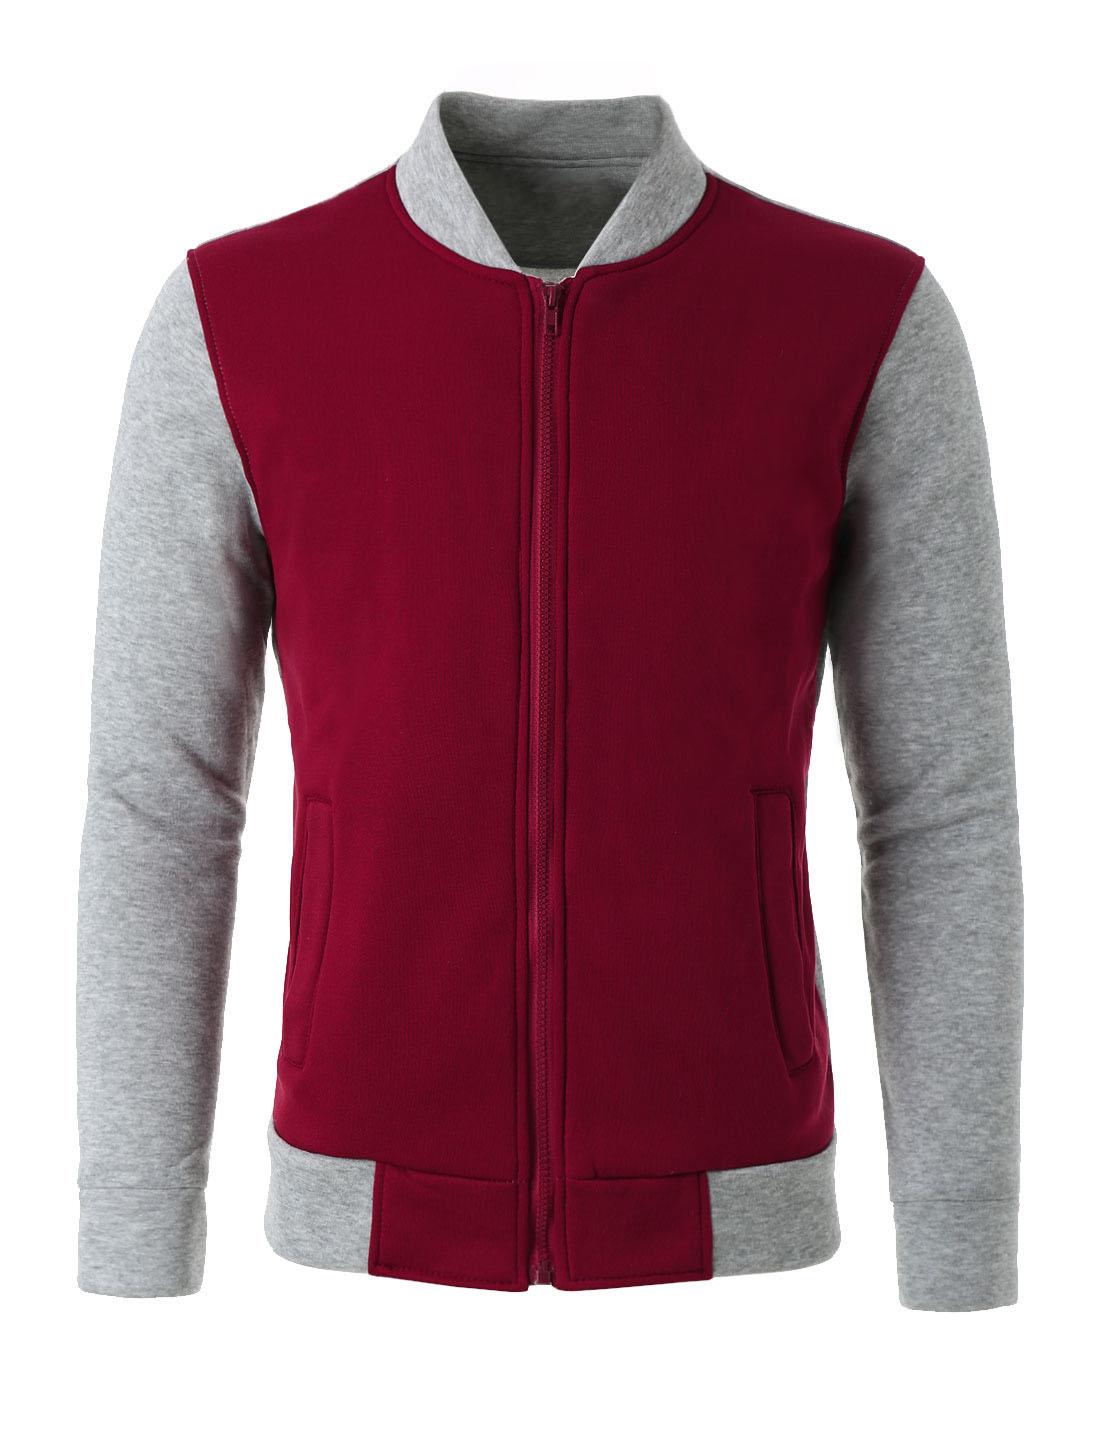 Men Color Block Stand Collar Zipper Front Varsity Jacket Burgundy Light Gray L